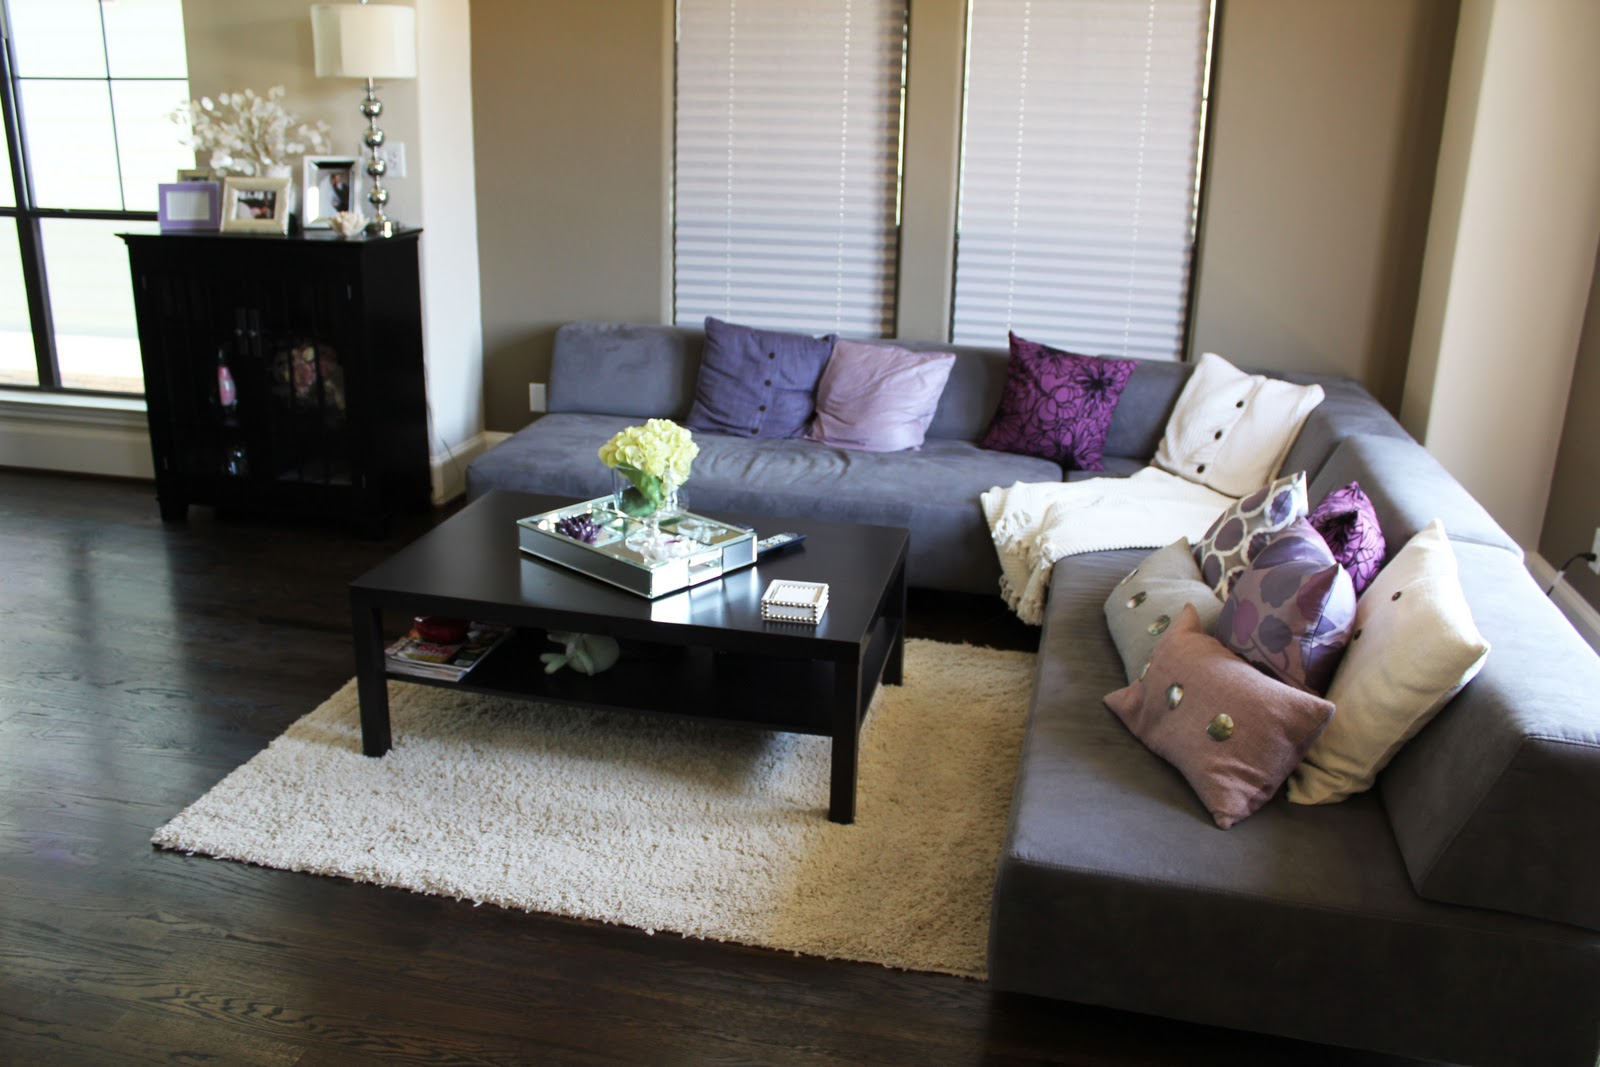 Home tour updates w furniture decor veronika 39 s blushing for Room decor marshalls